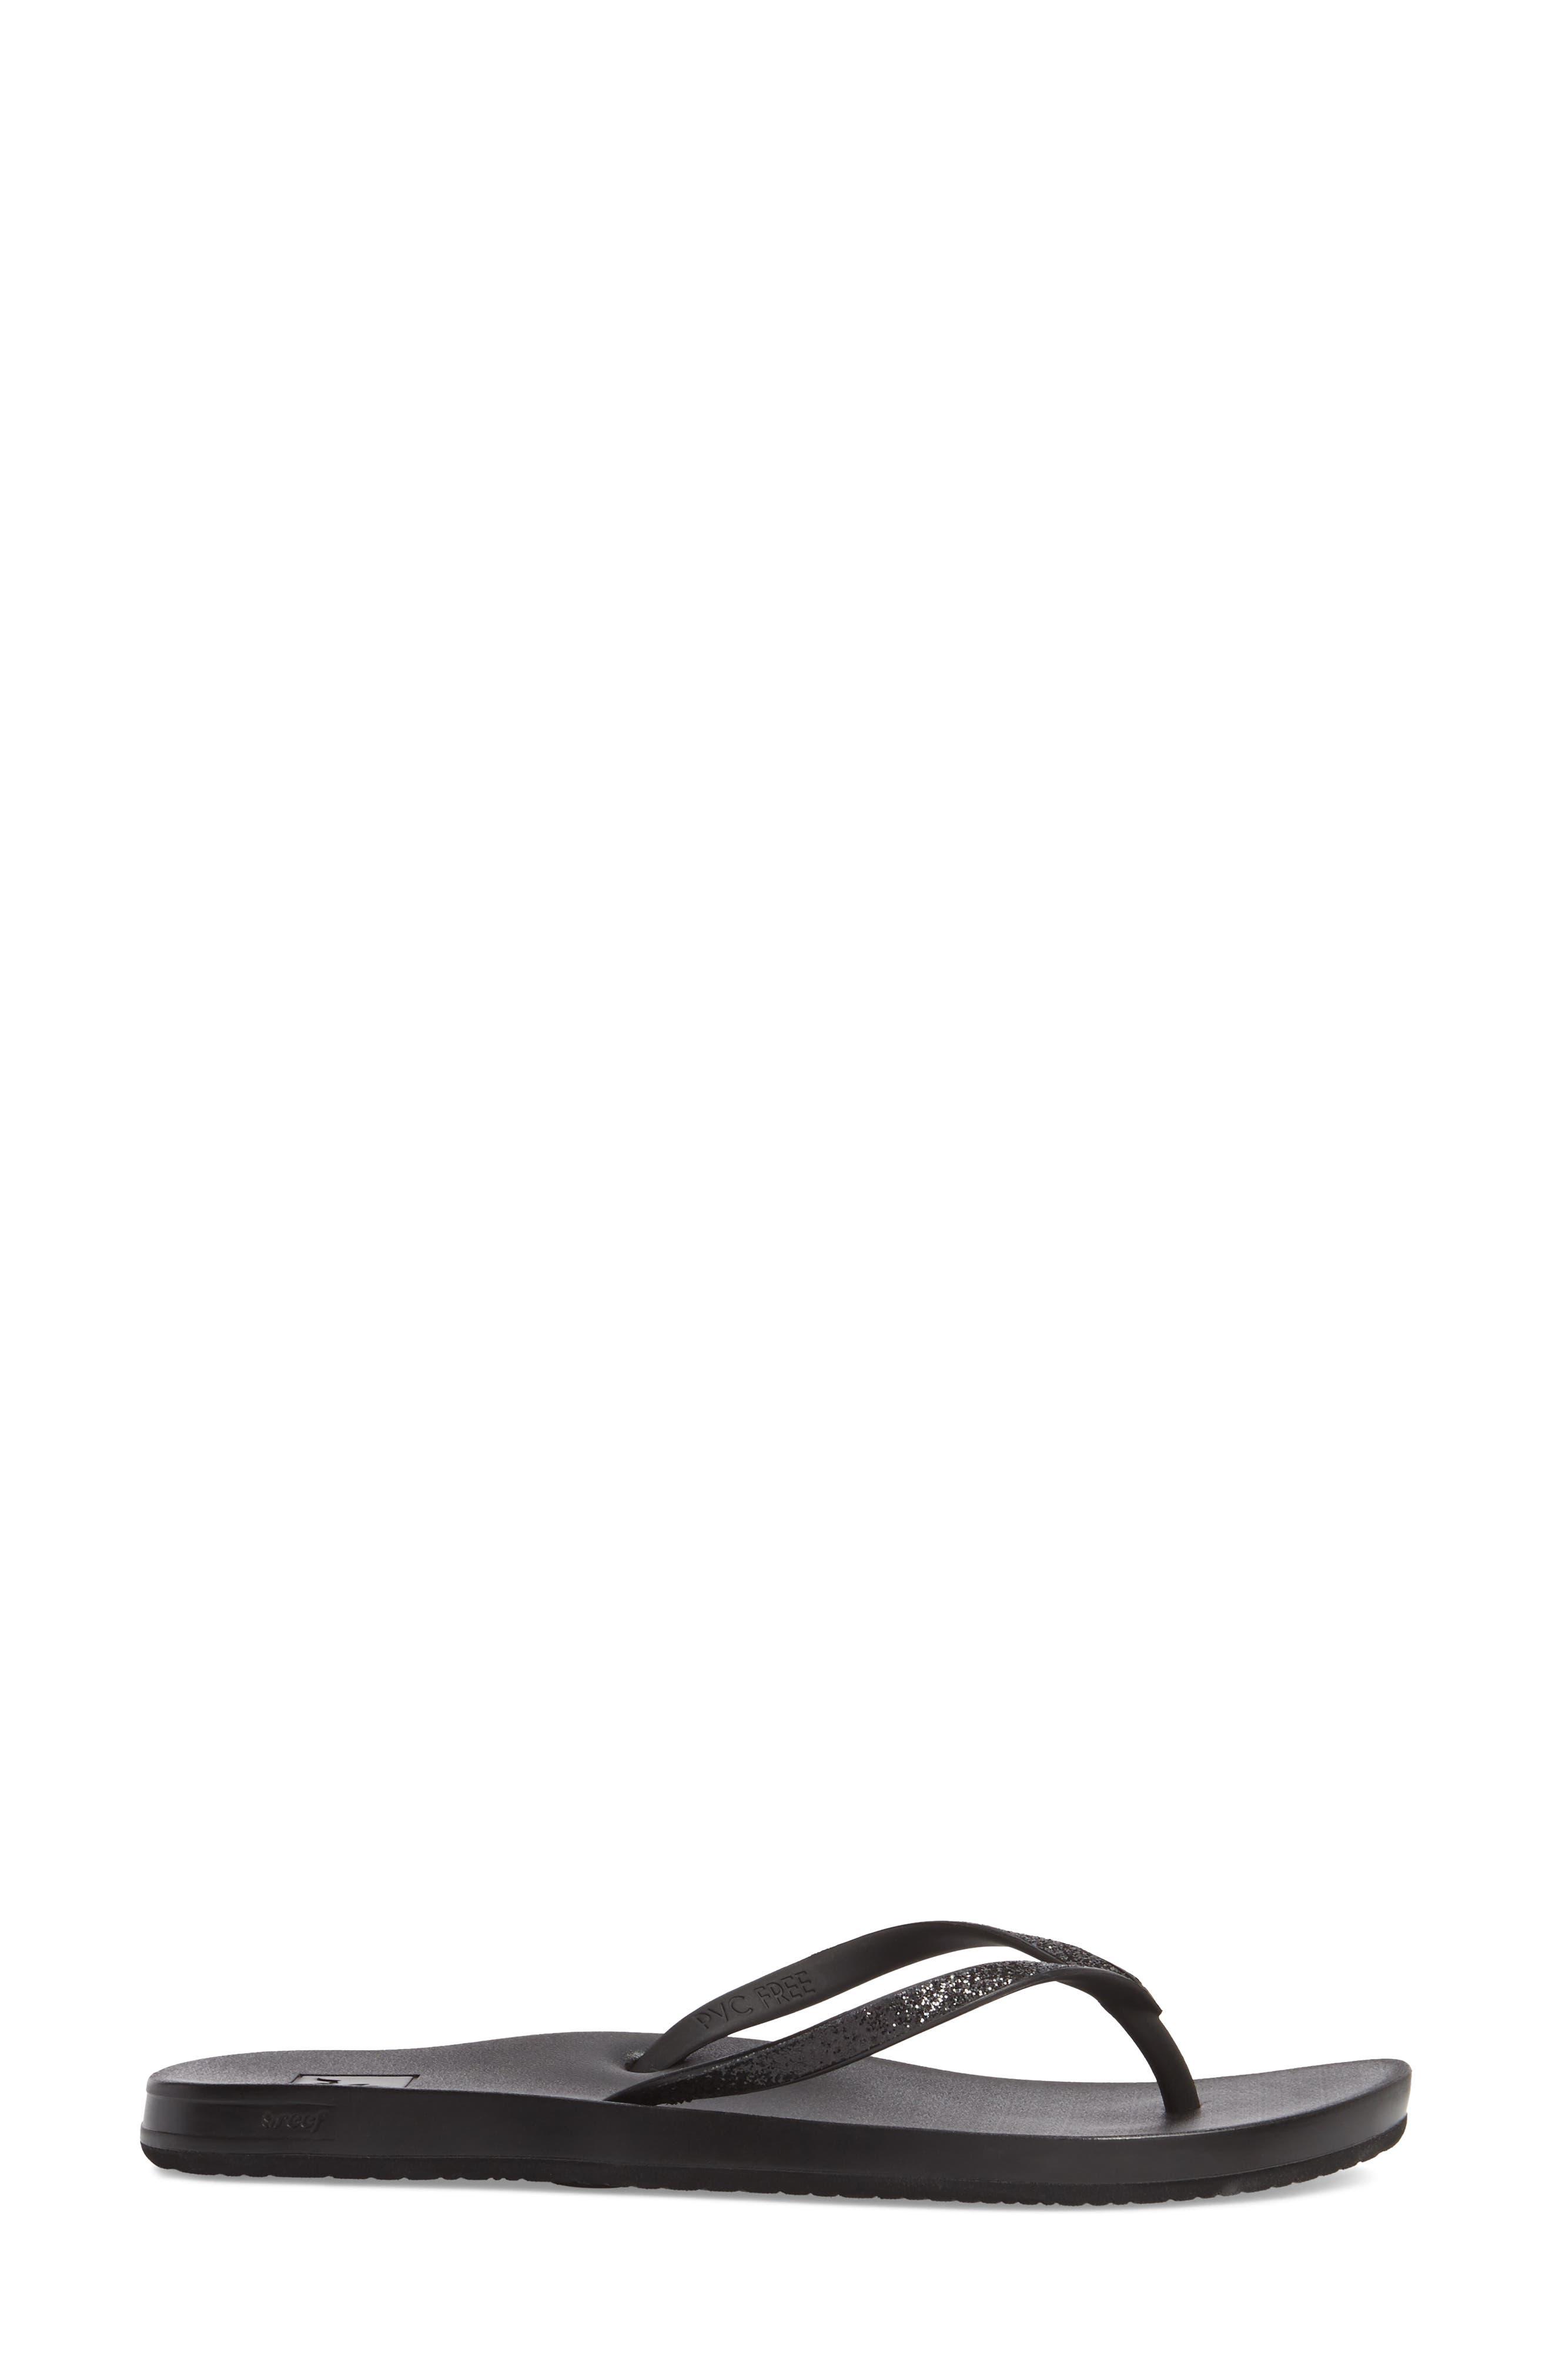 REEF, Cushion Bounce Stargazer Flip Flop, Alternate thumbnail 3, color, BLACK